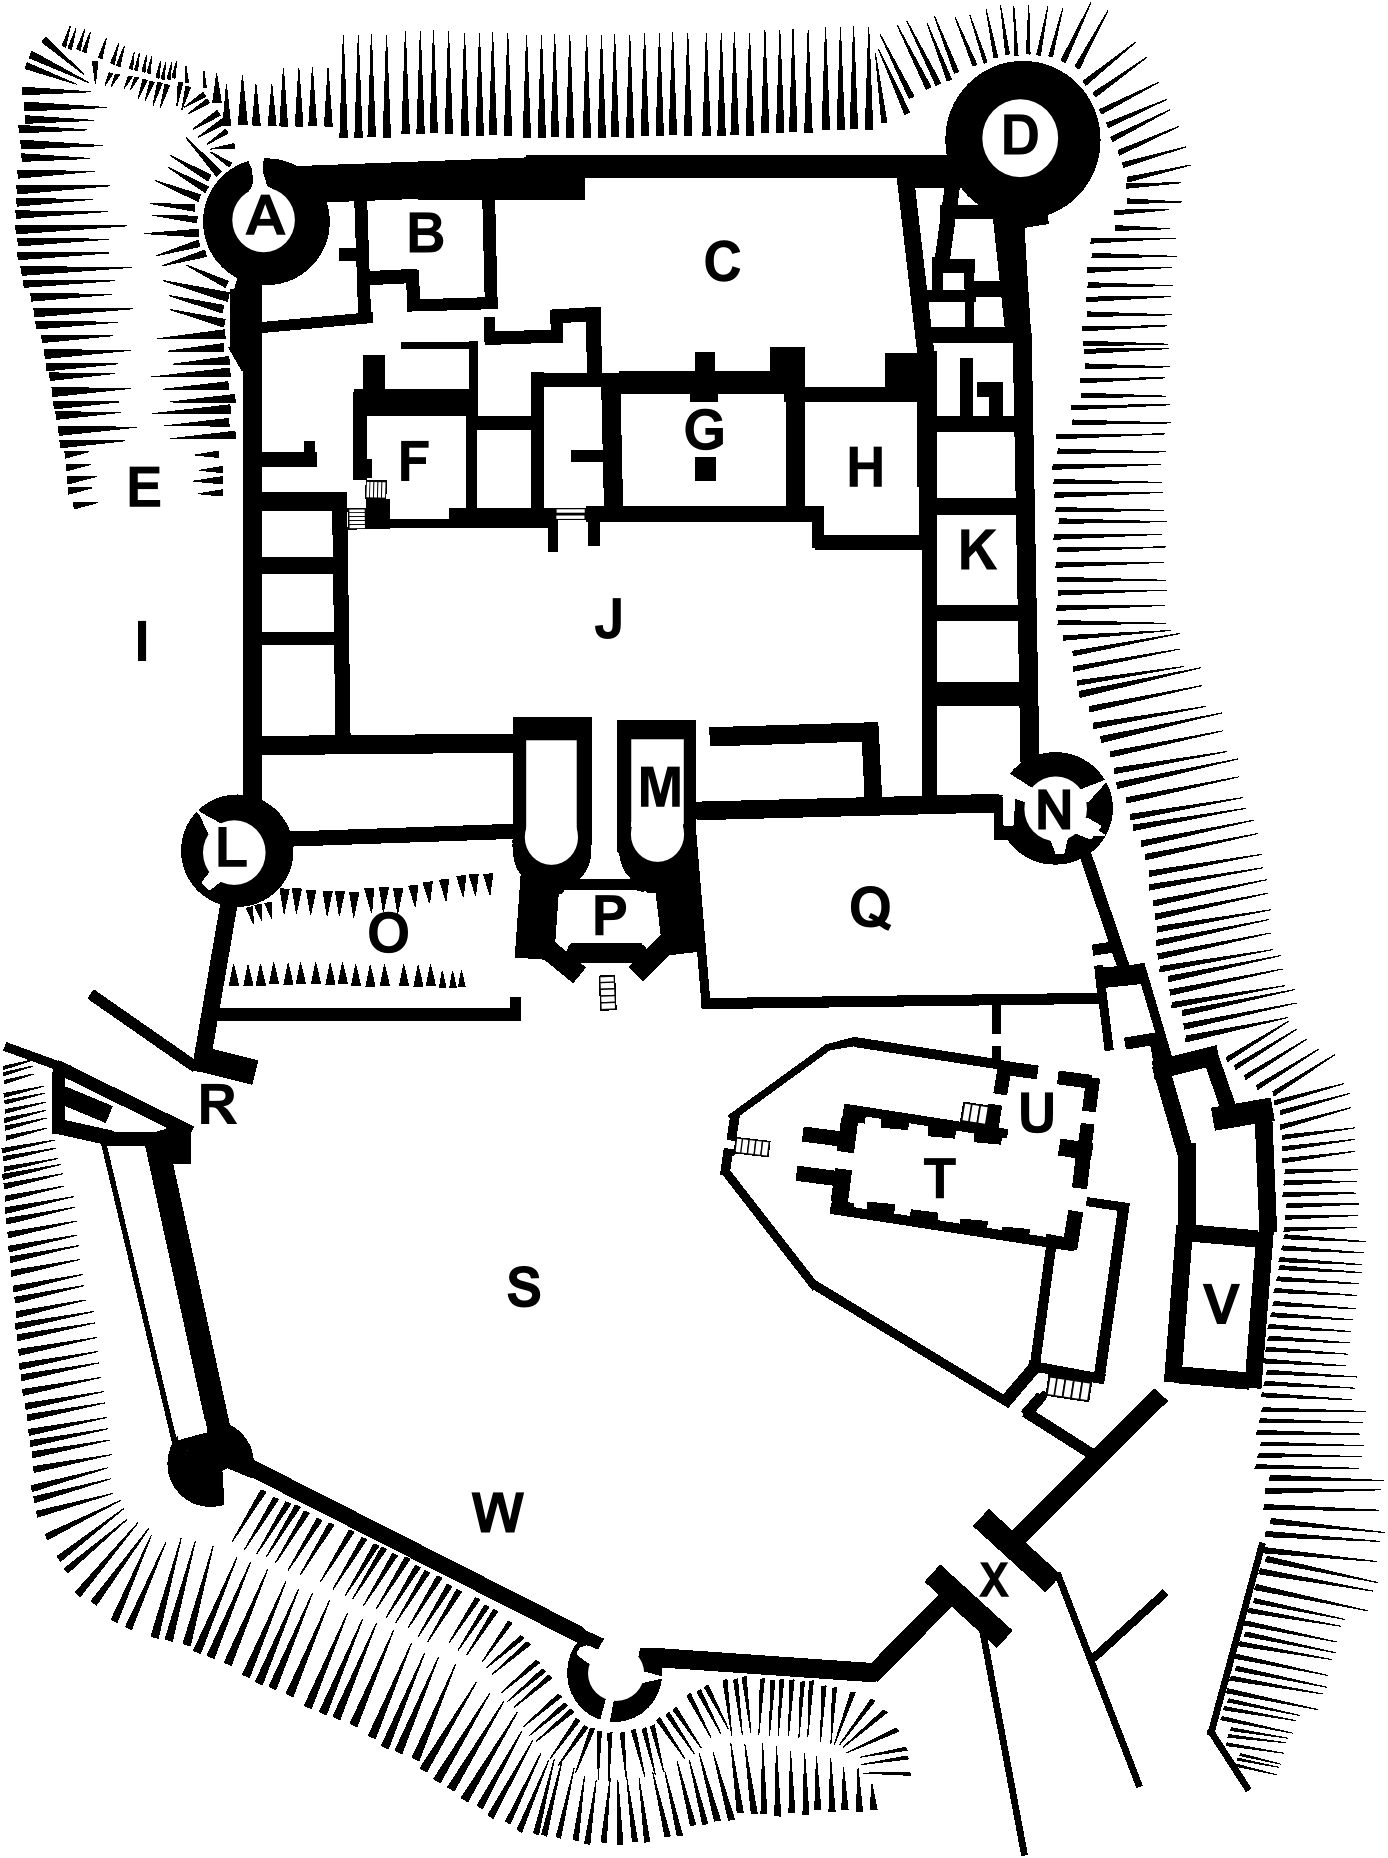 Farleigh Hungerford Castle Military Wiki Fandom